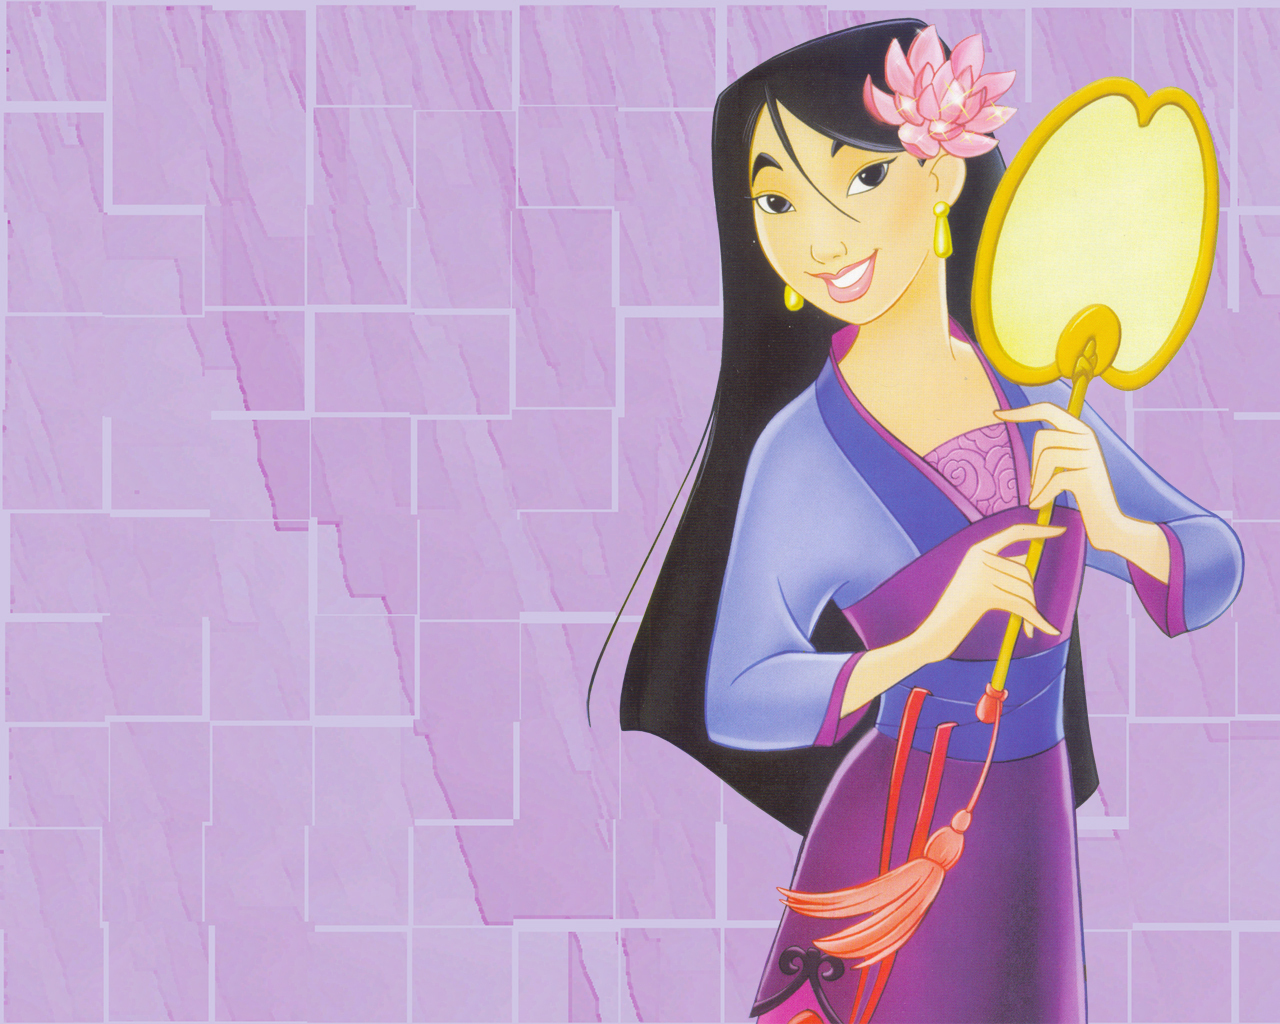 Princess Mulan Disney Disney Princess Mulan 1280x1024 Wallpaper Teahub Io